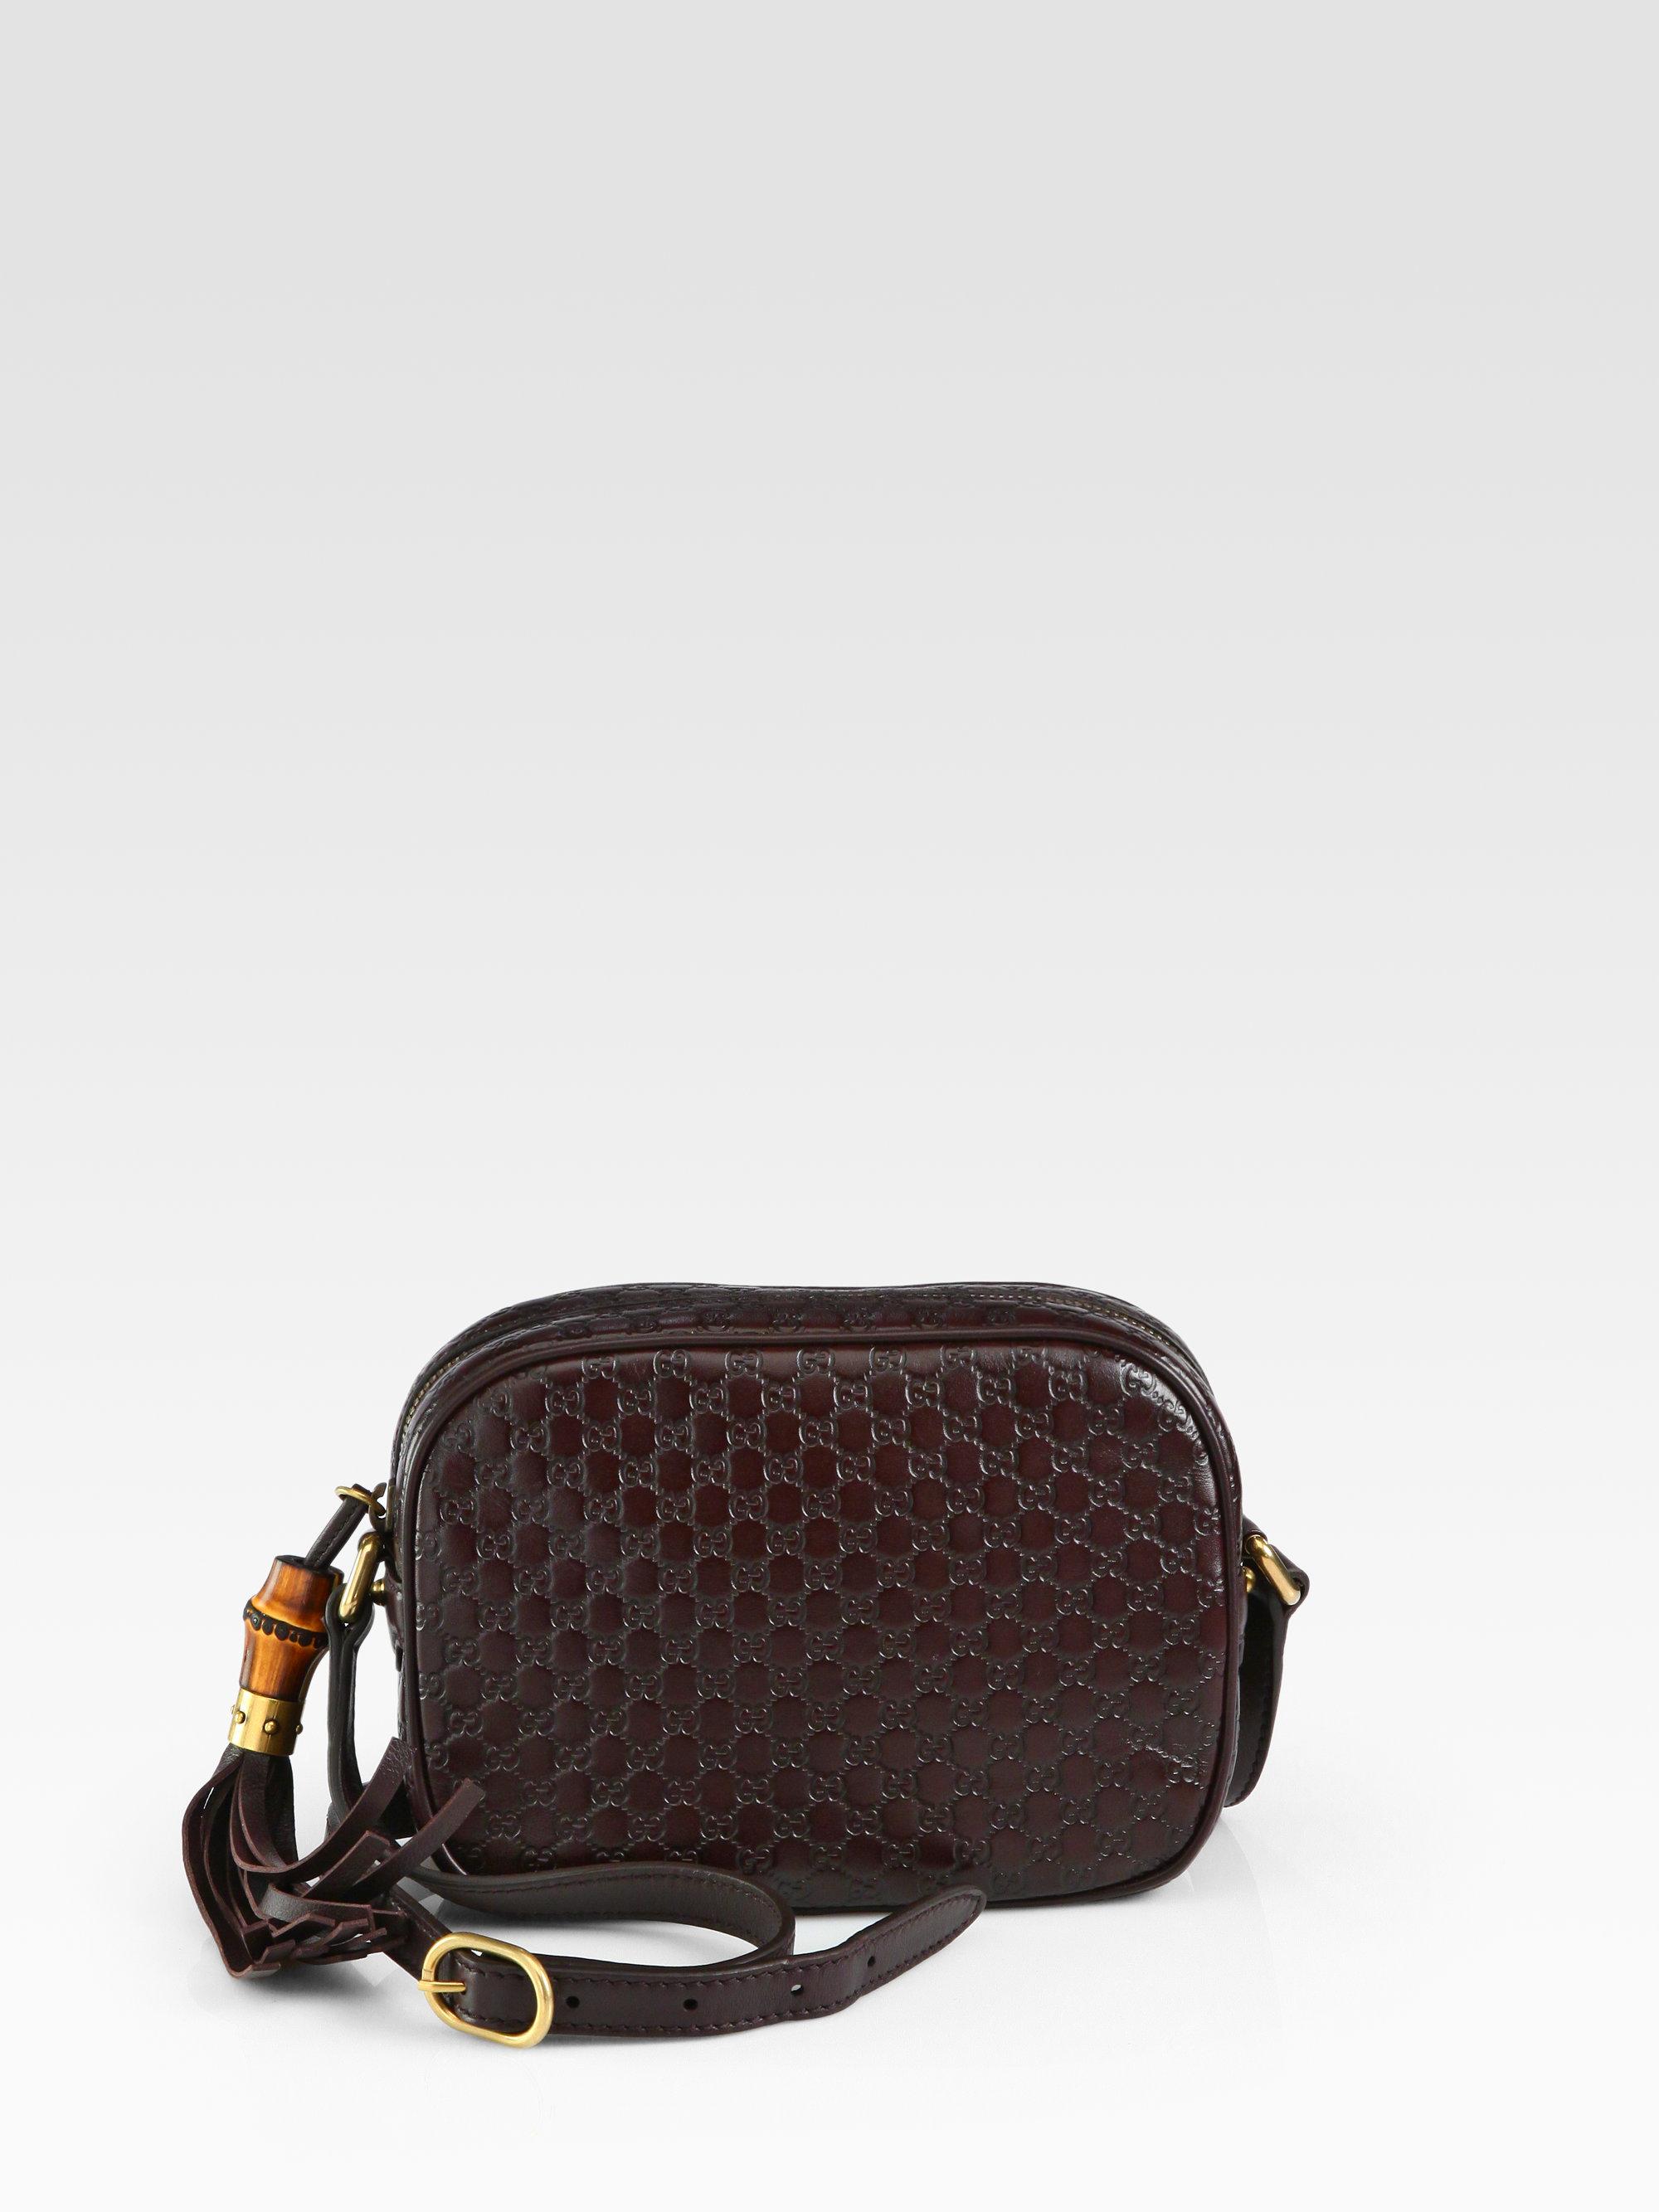 cd030524d0eaa Lyst - Gucci Sunshine Microguccissima Disco Bag in Brown